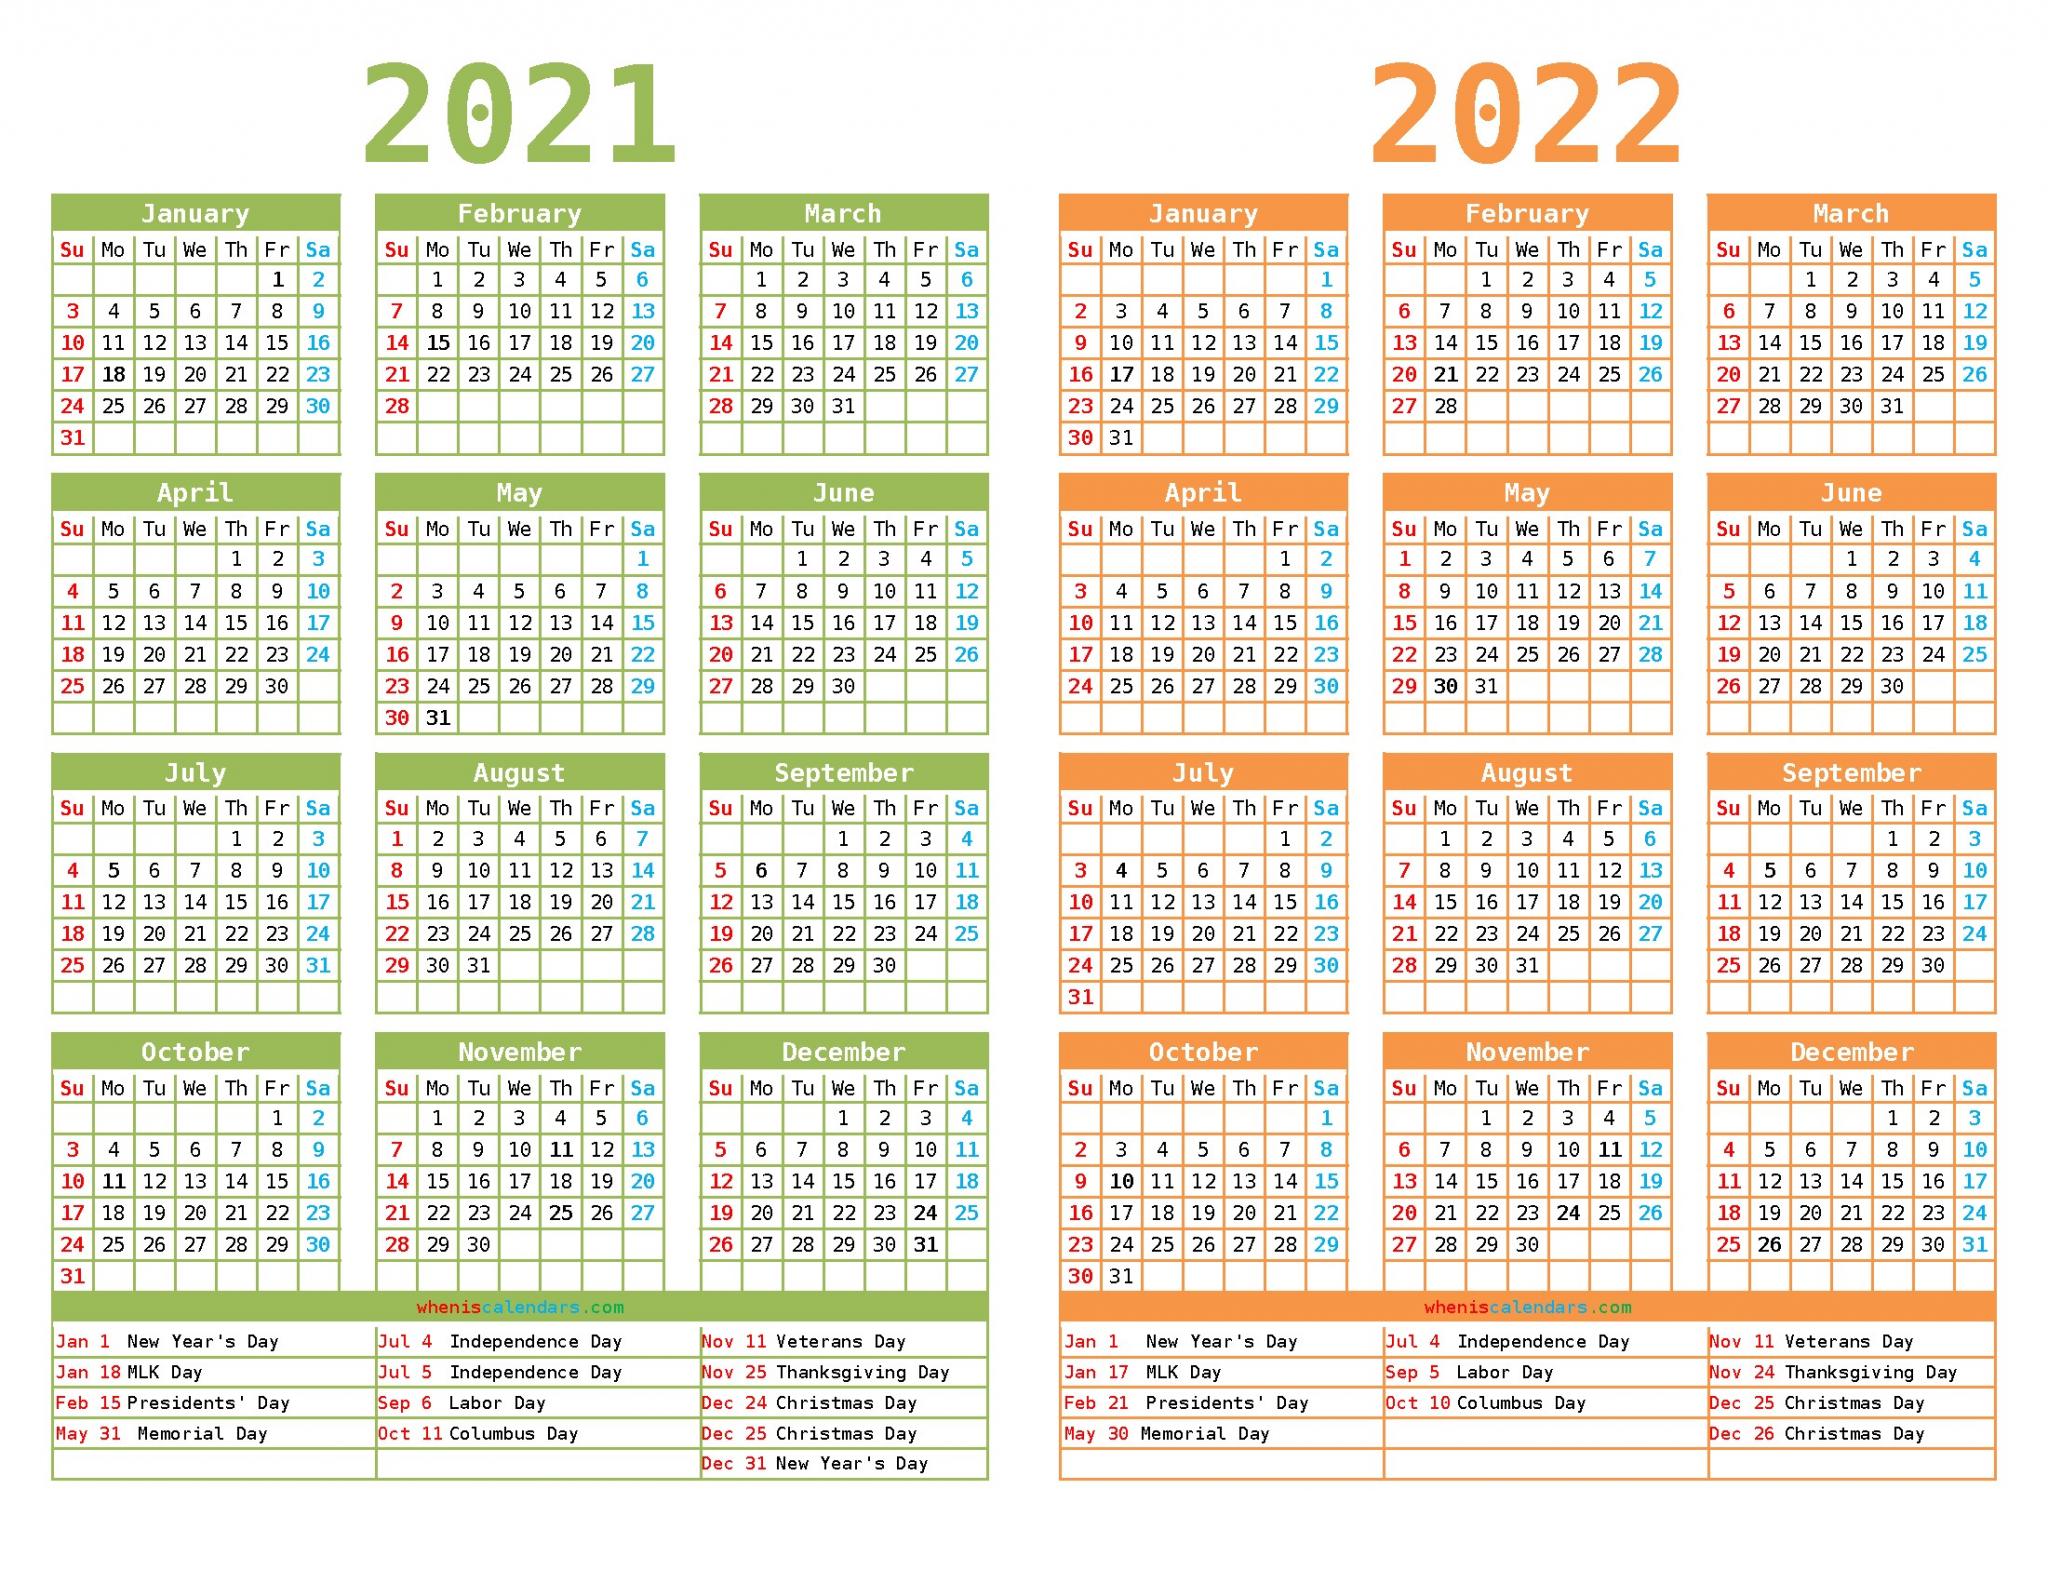 Usps Calendar 2022.Two Year Calendar 2021 To 2022 In 2021 Calendar Design Template Calendar Template Free Printable Calendar Monthly